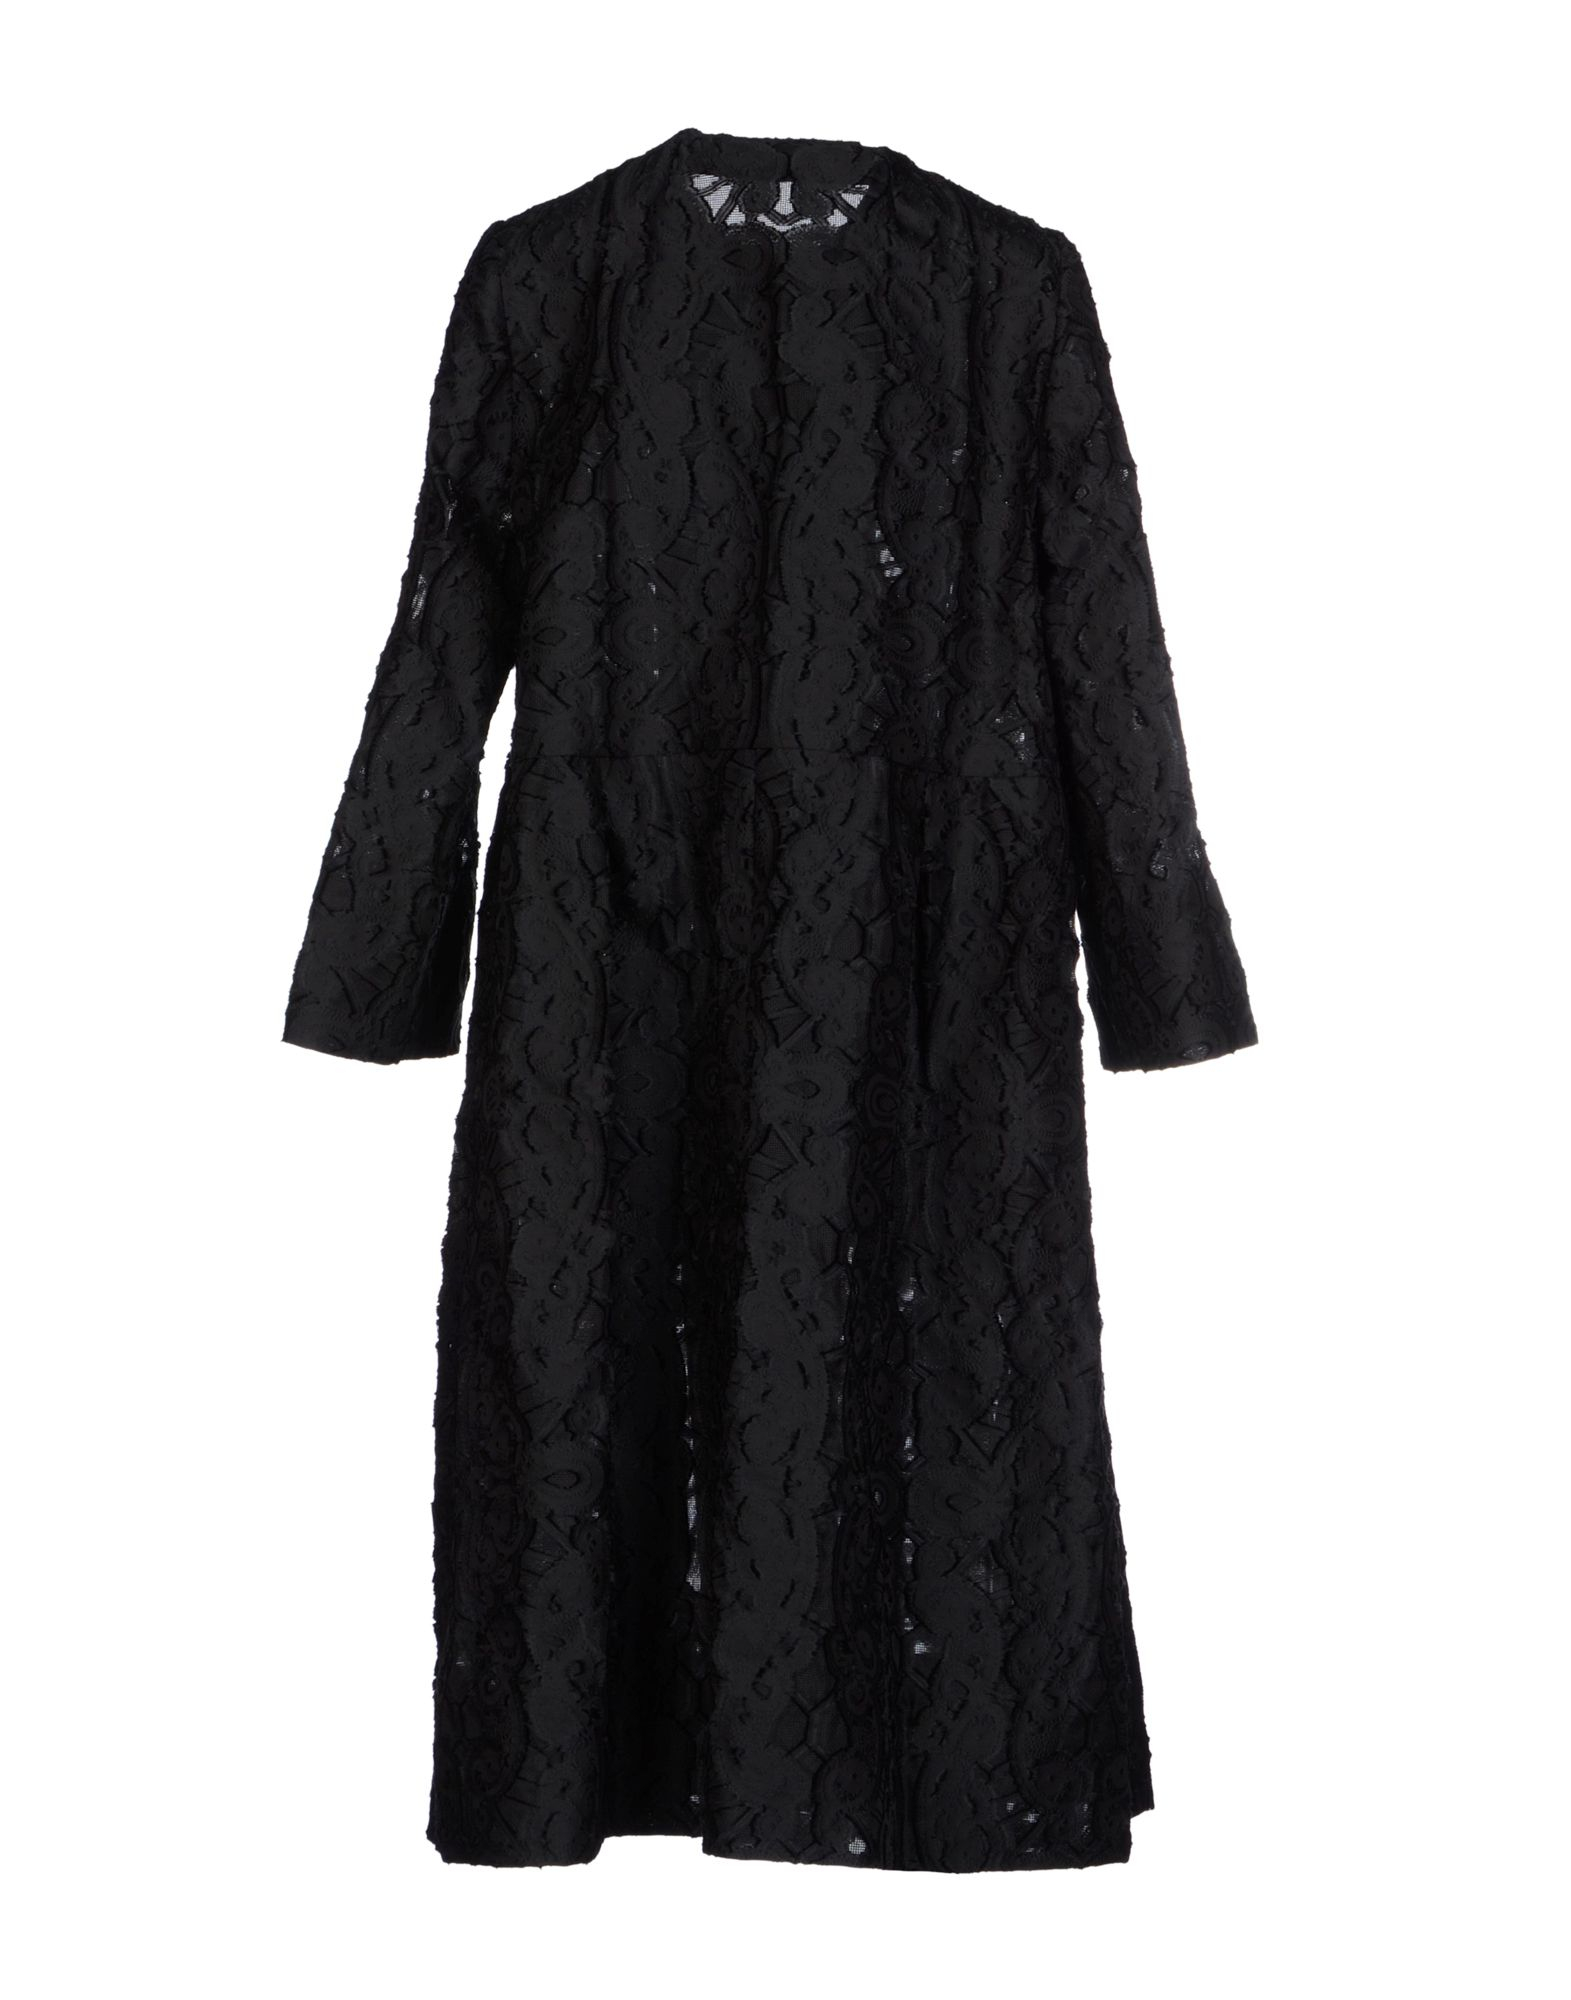 lyst dolce gabbana fitted jacket in black. Black Bedroom Furniture Sets. Home Design Ideas